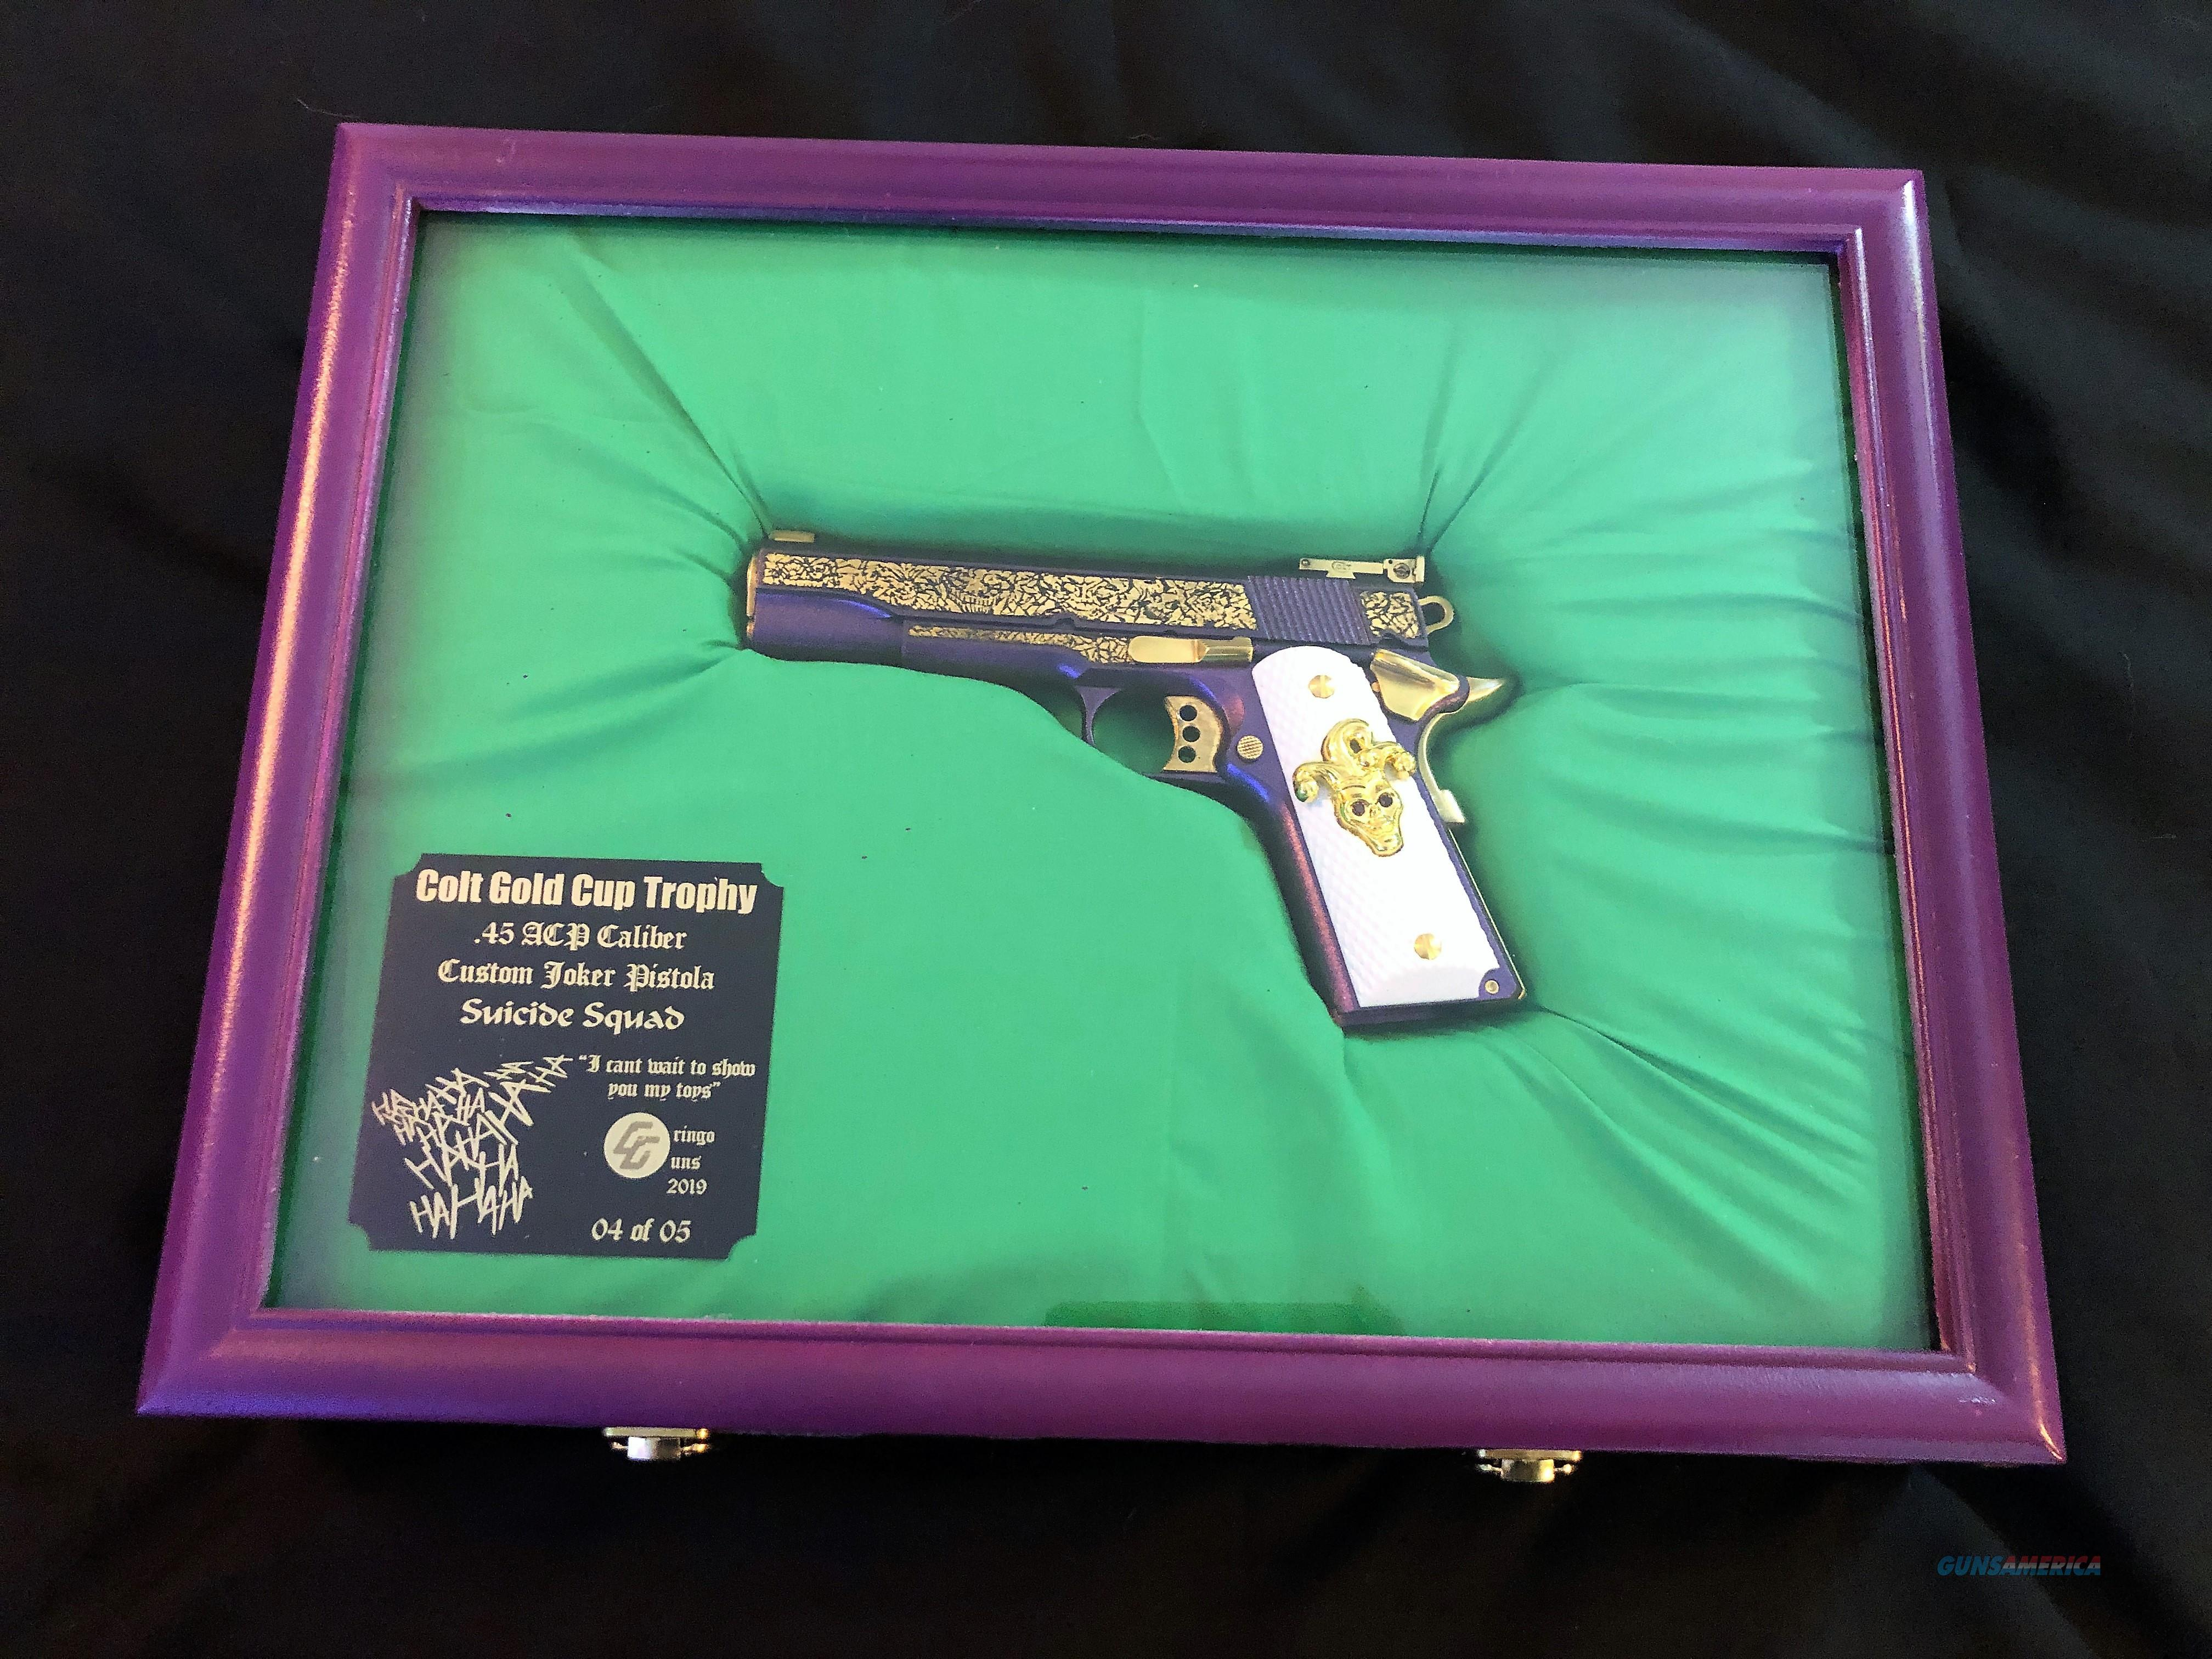 RARE Custom Colt Joker Gun from Suicide Squad movie EXACT REPLICA #4 of 5  Guns > Pistols > Colt Automatic Pistols (1911 & Var)